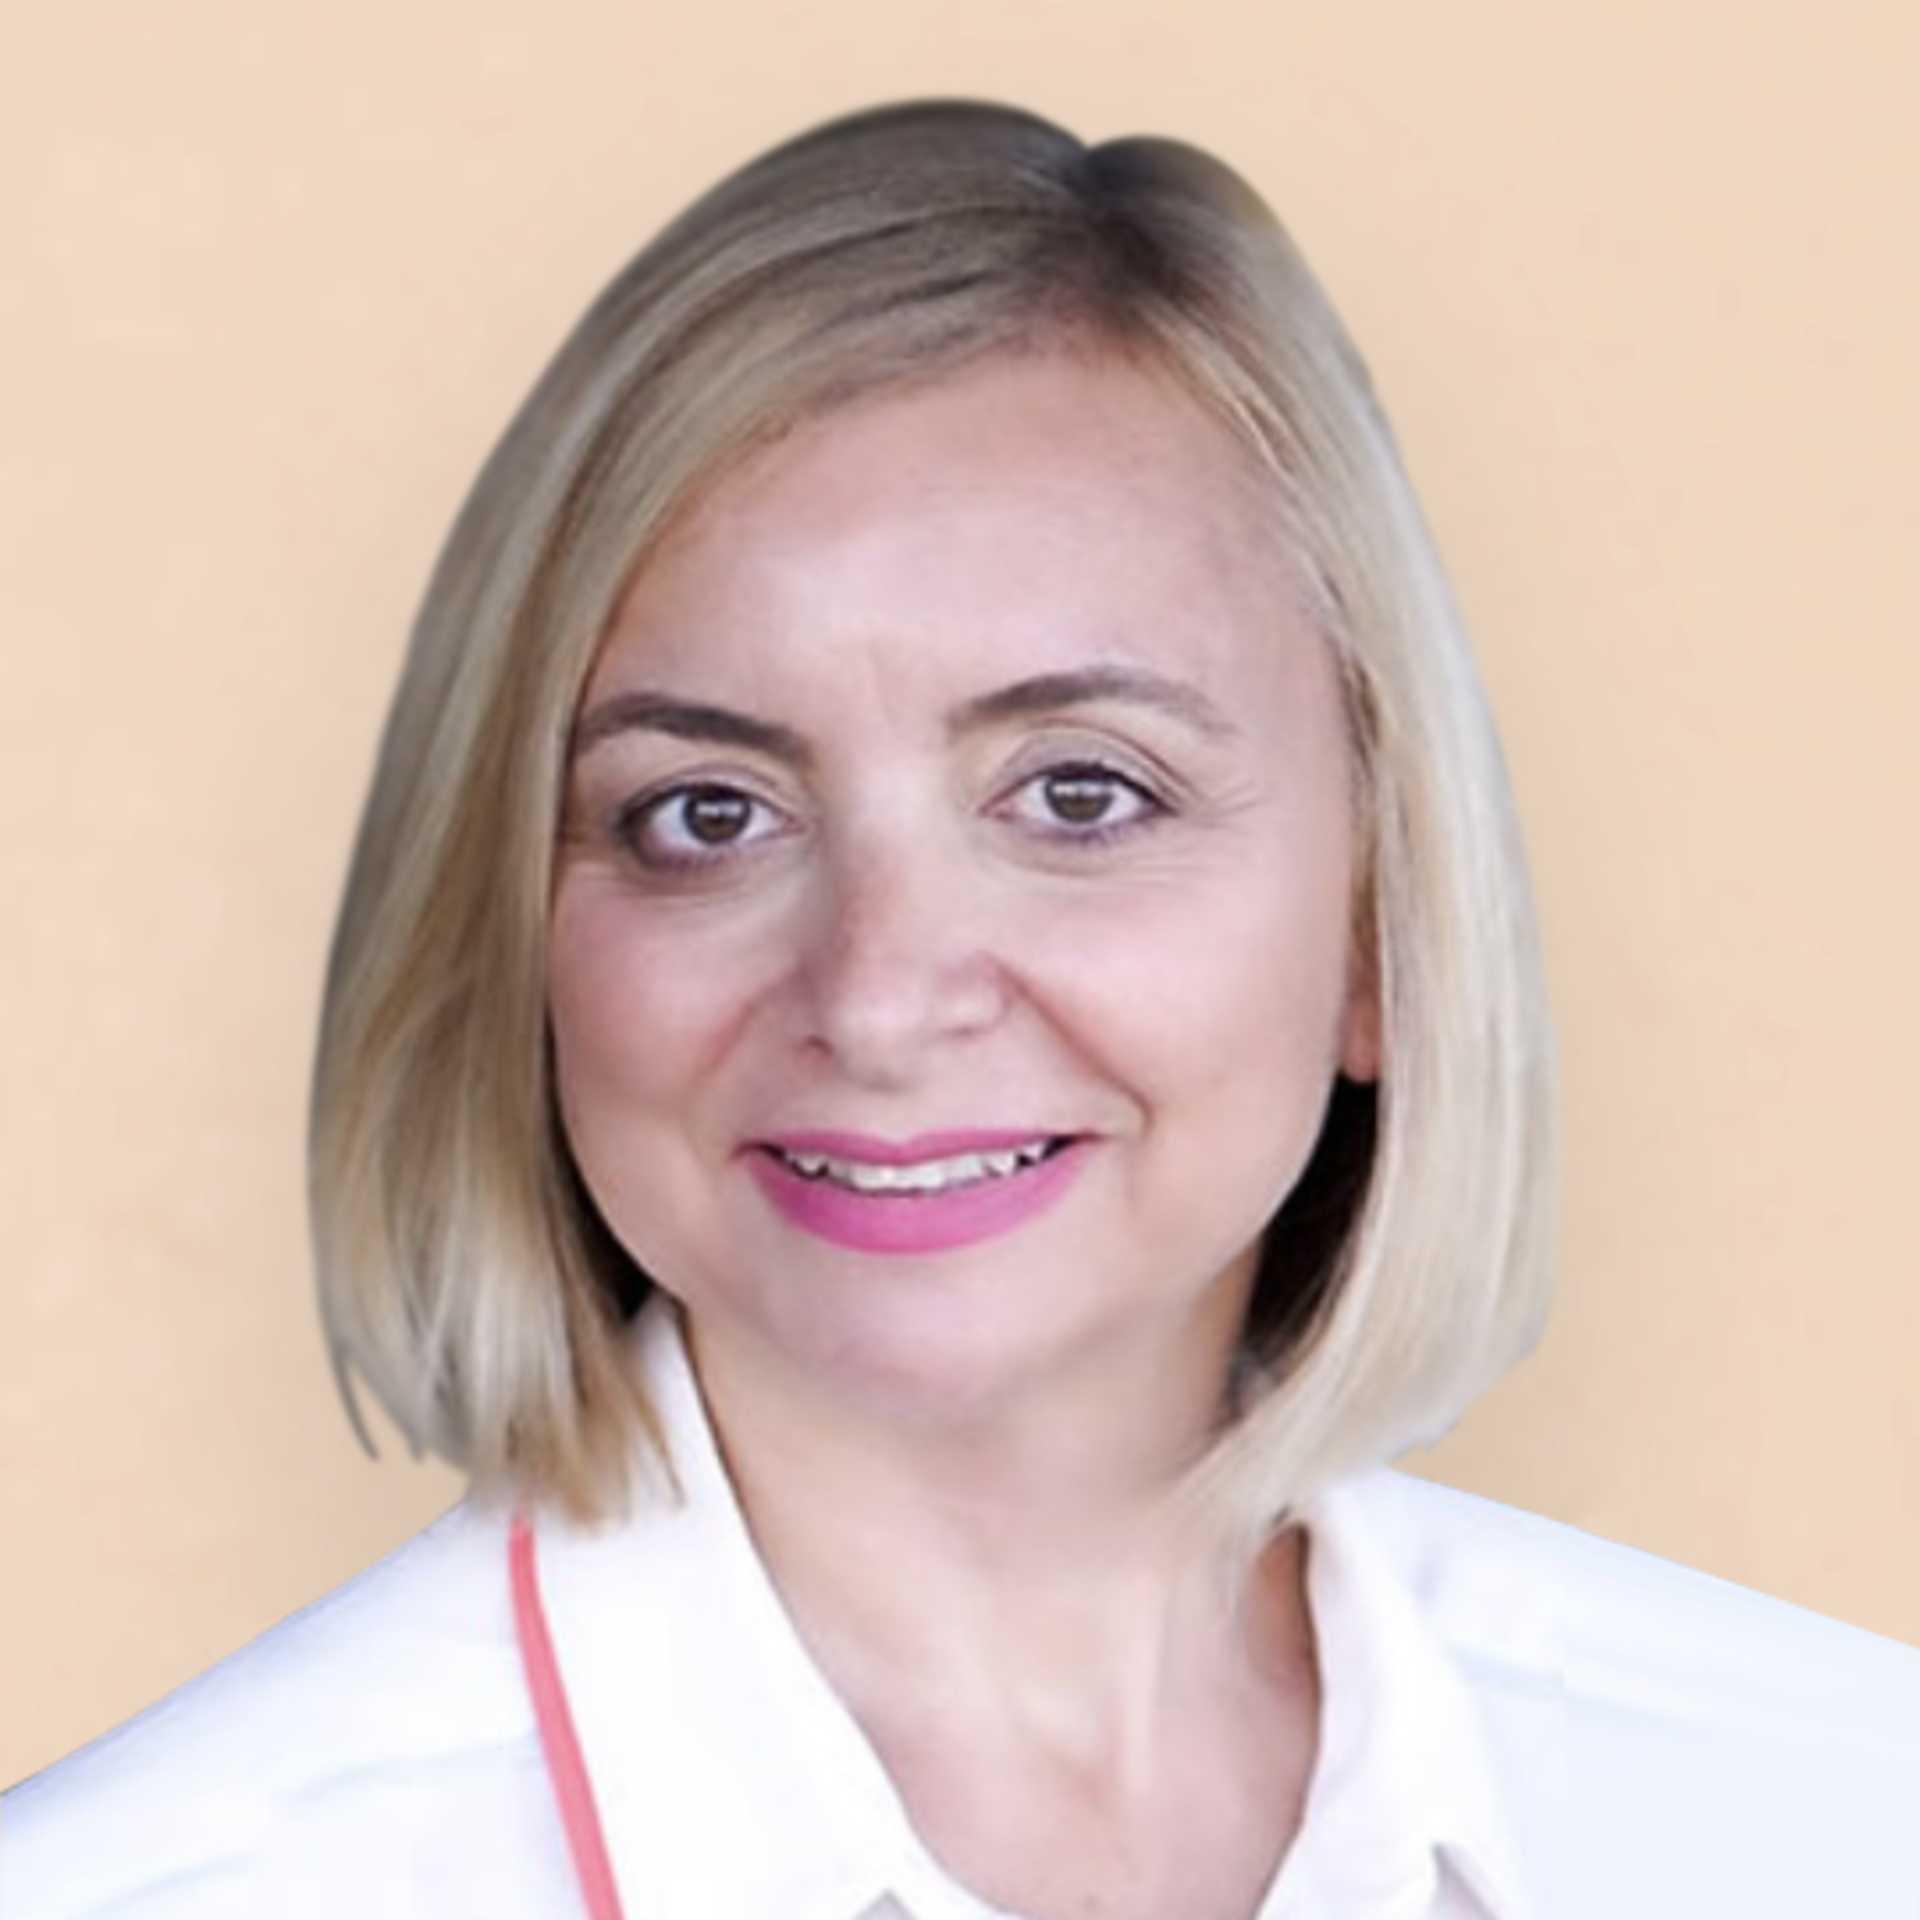 Photo of Gassia Ekzian